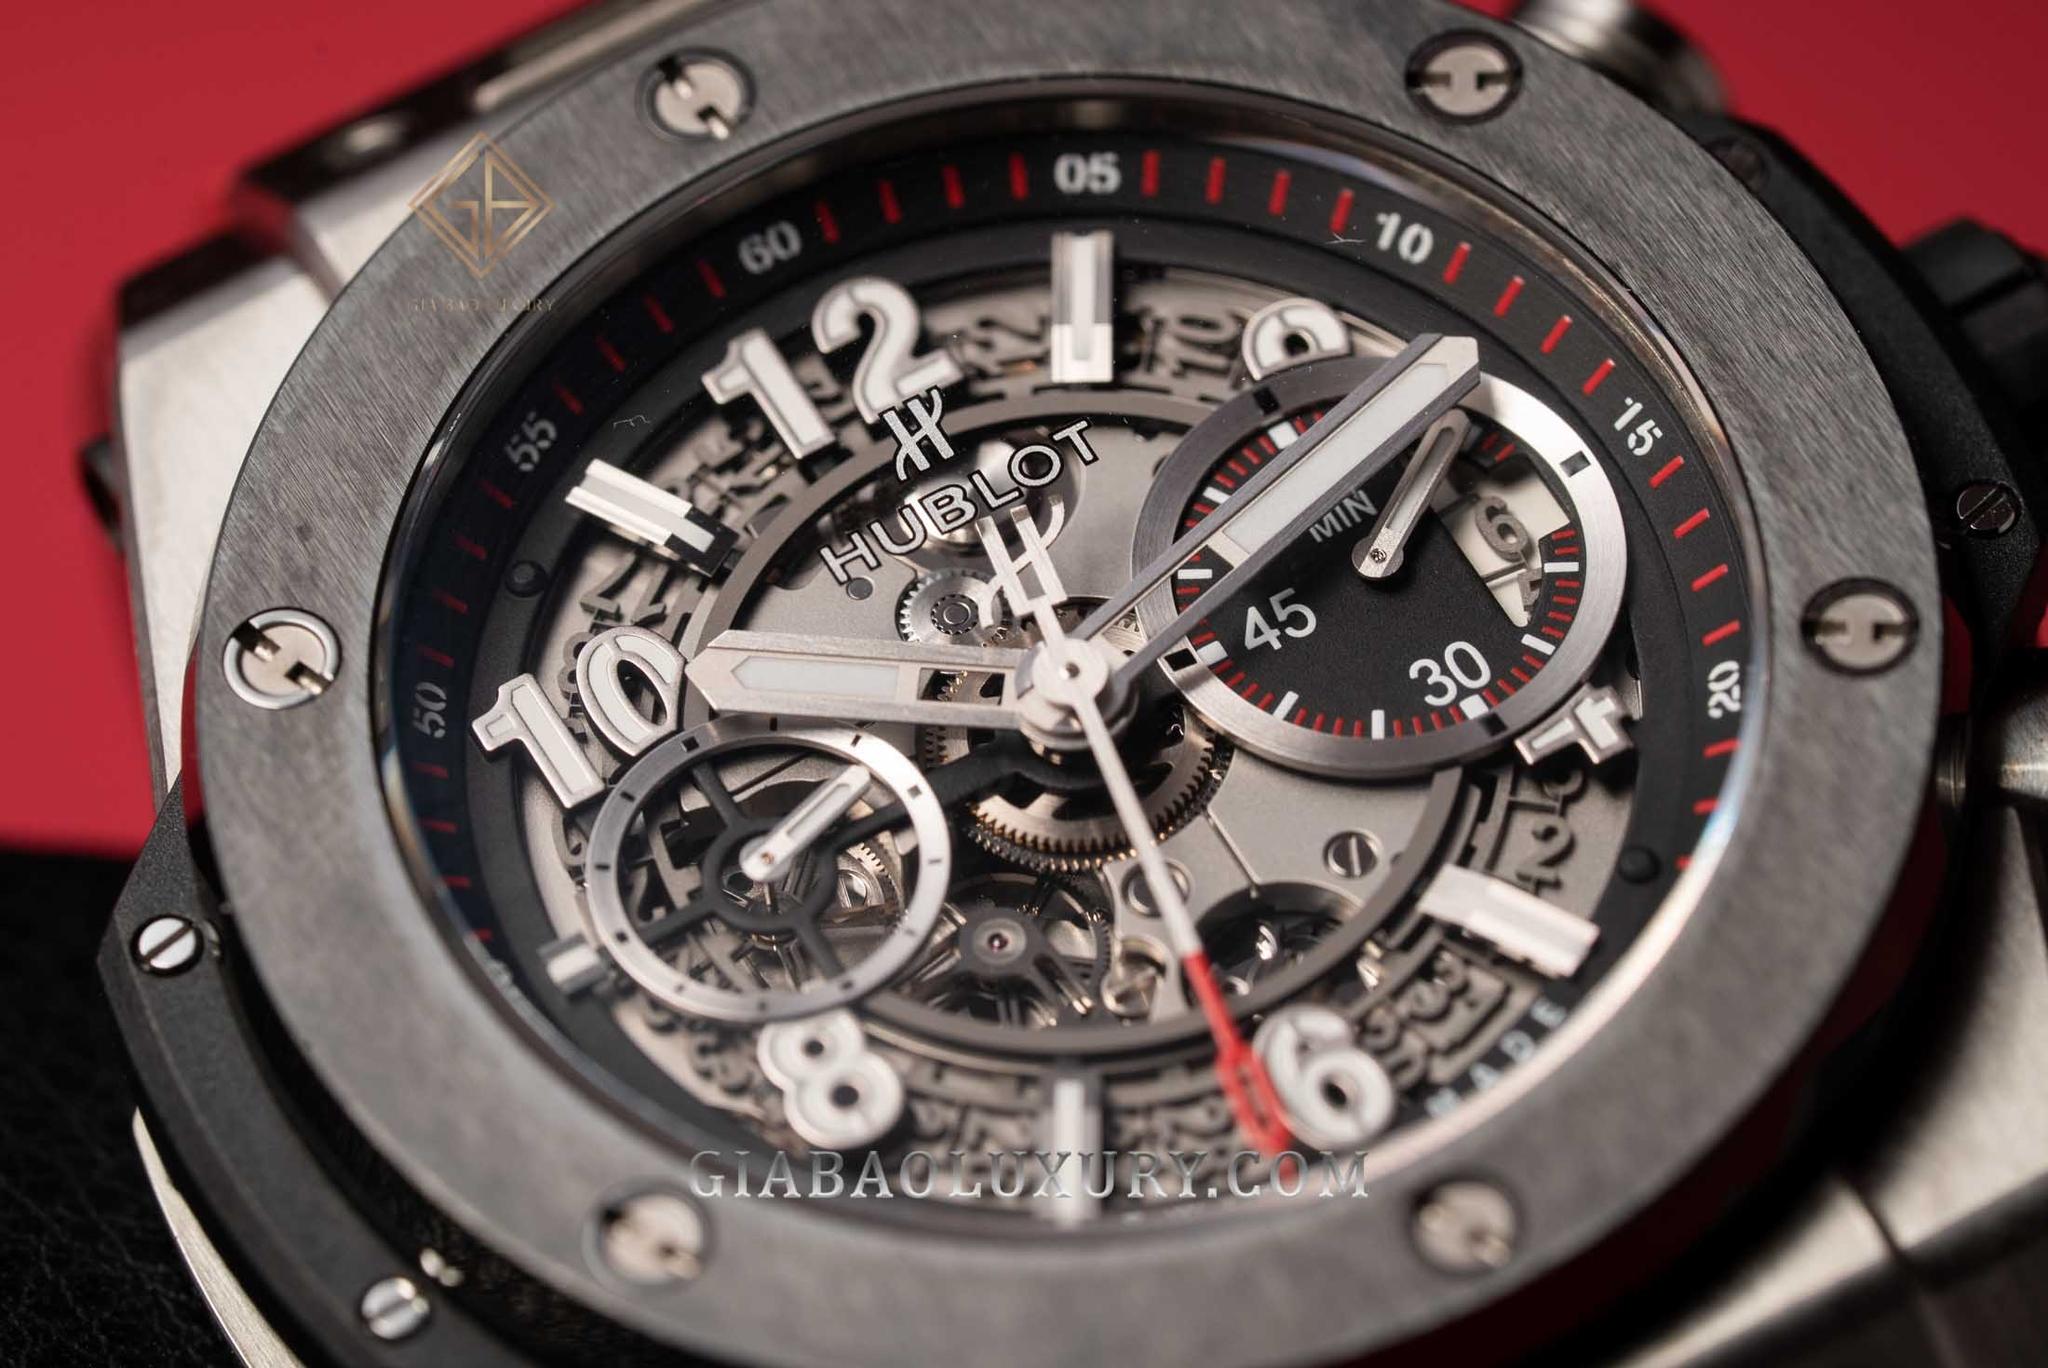 Review đồng hồ Hublot Big Bang Unico 45 Titanium Ceramic